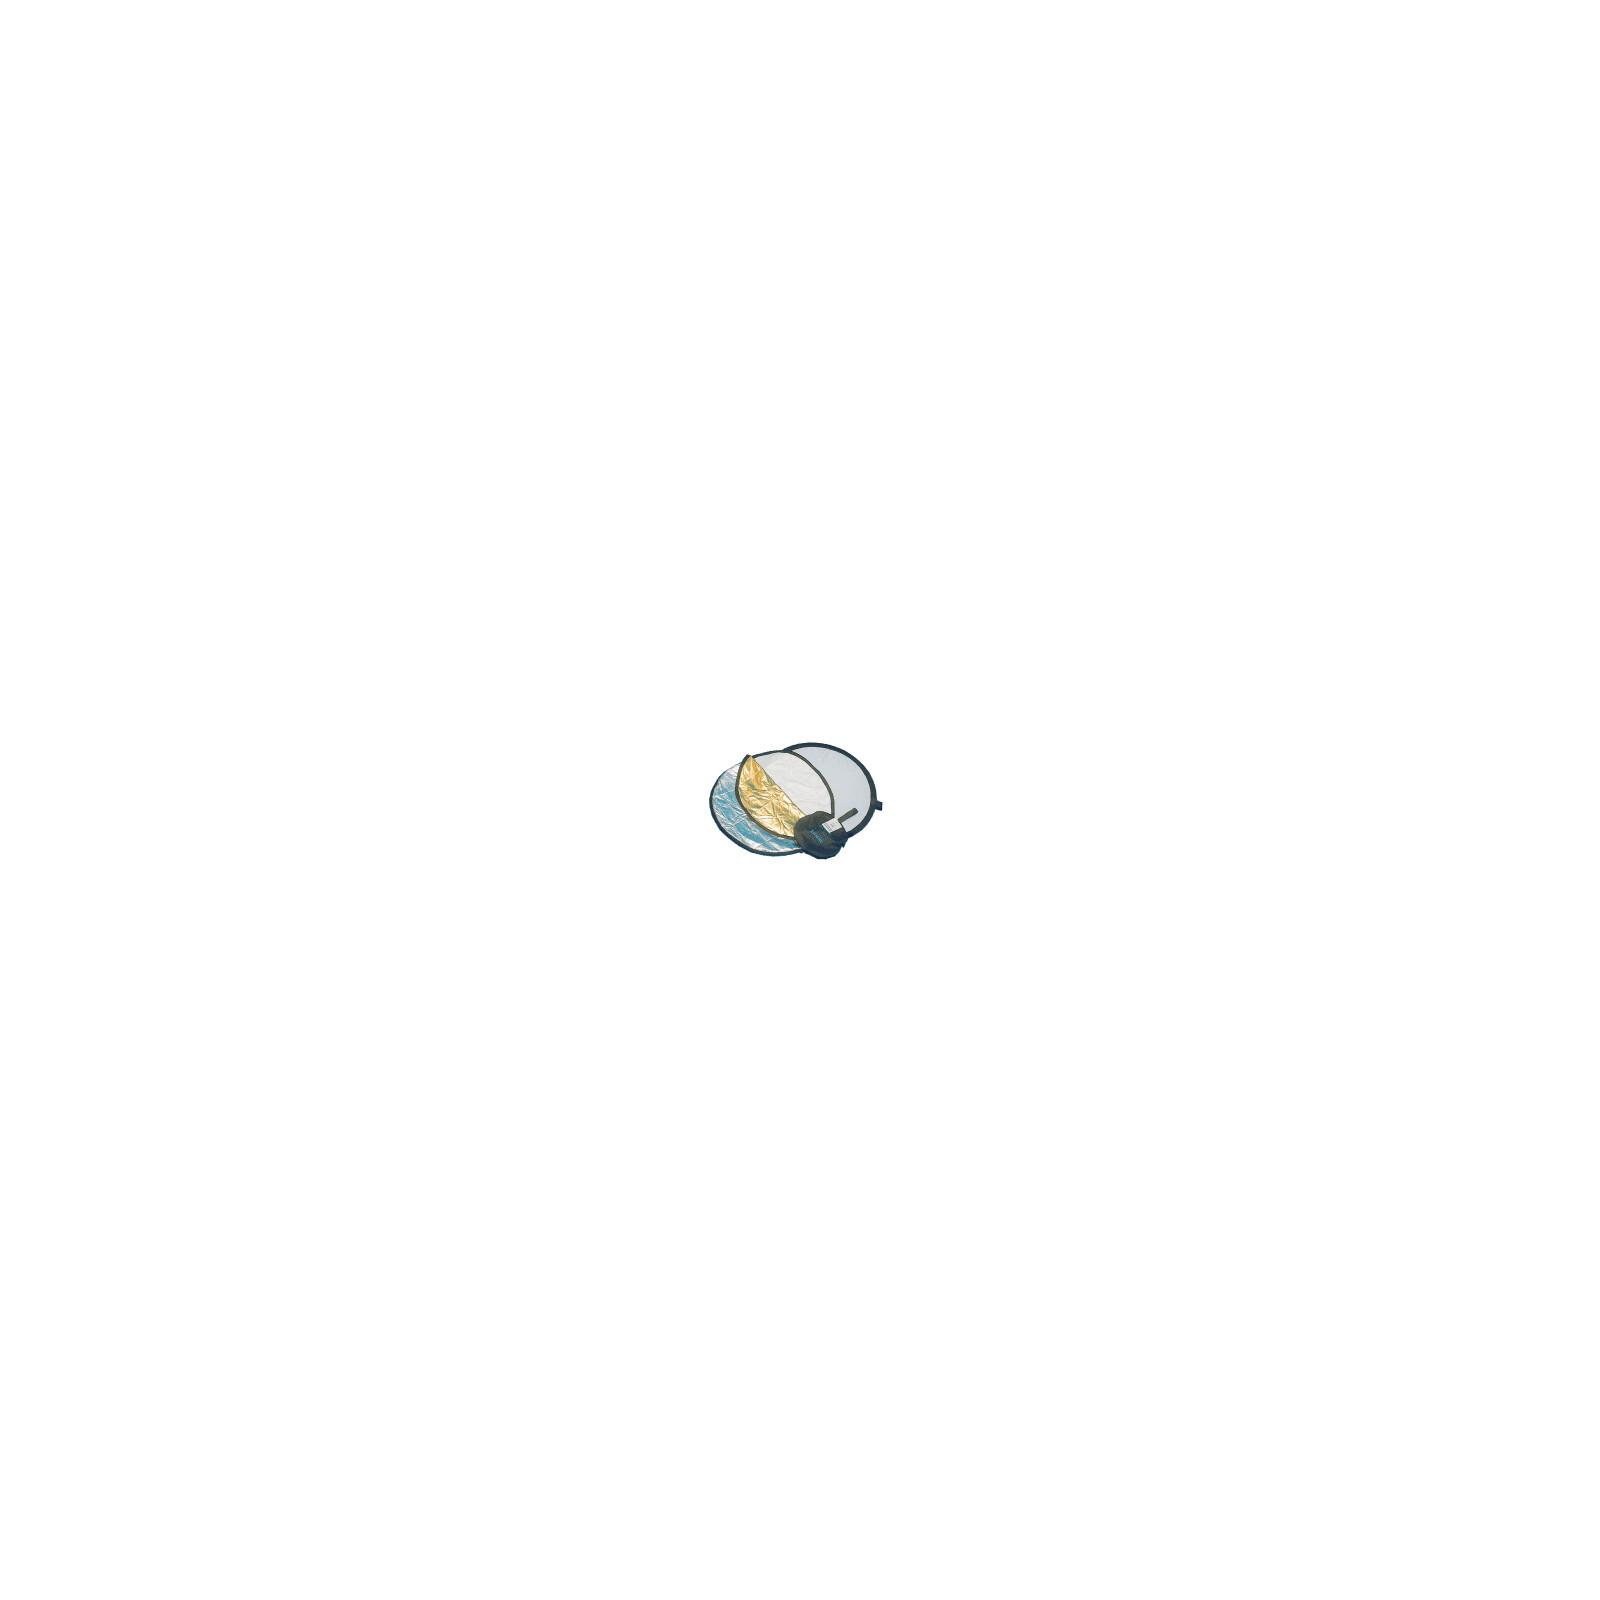 Dörr CRK-22 Faltreflektor 5in1